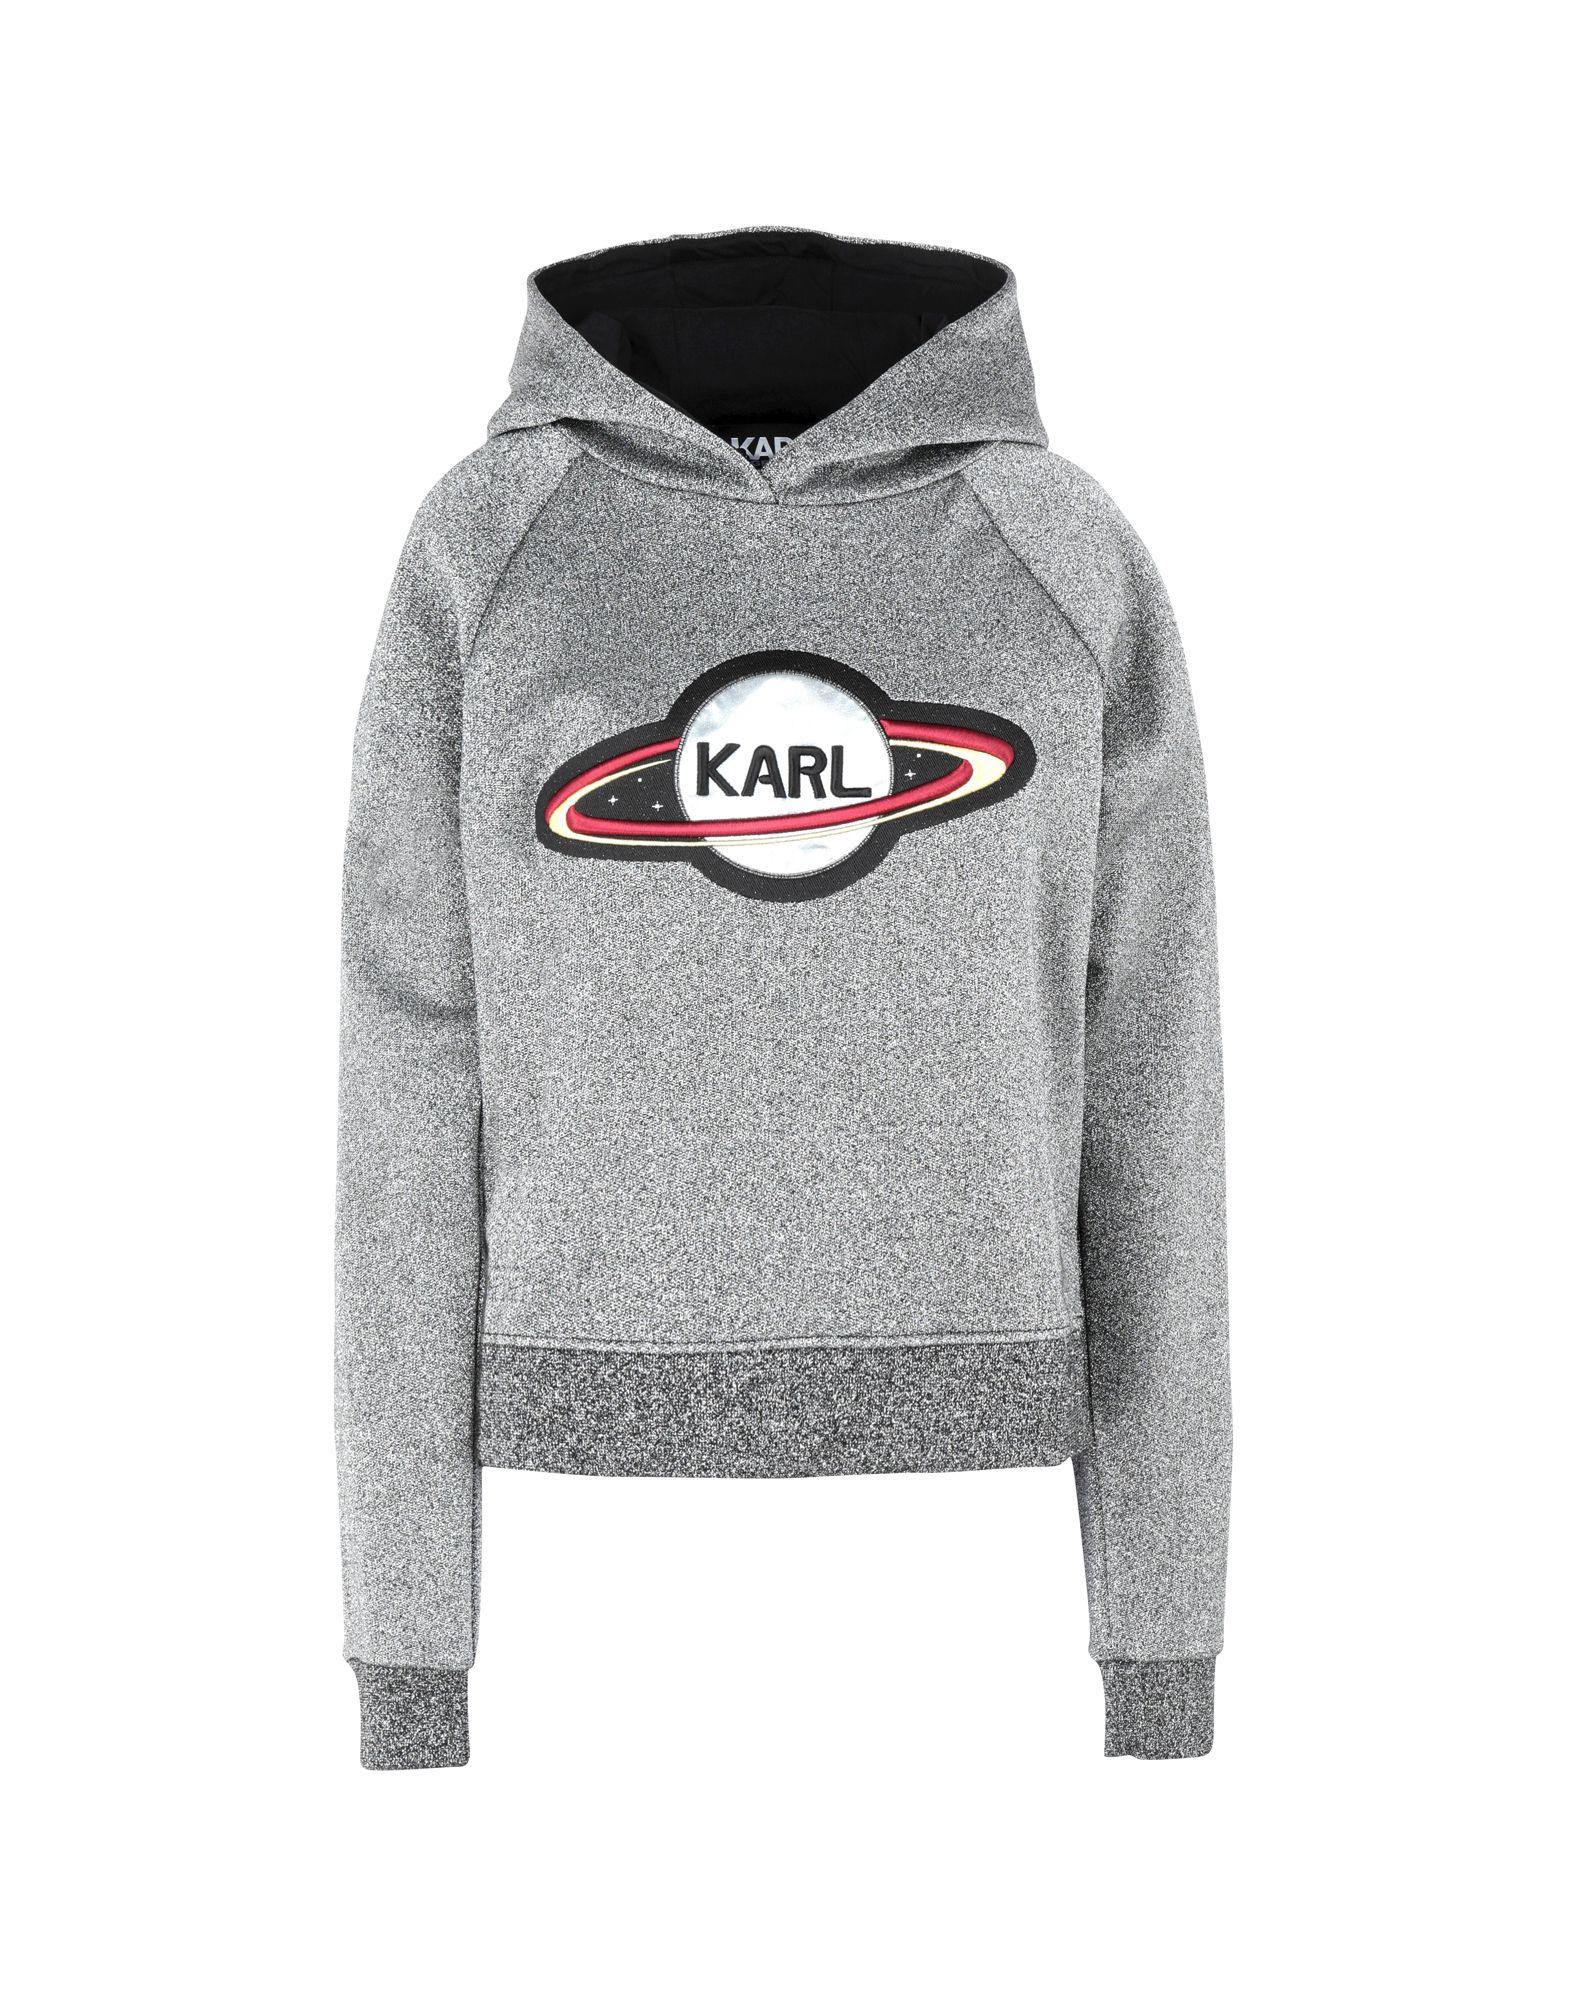 KARL LAGERFELD Толстовка толстовка серая с принтом karl lagerfeld kids ут 00019201